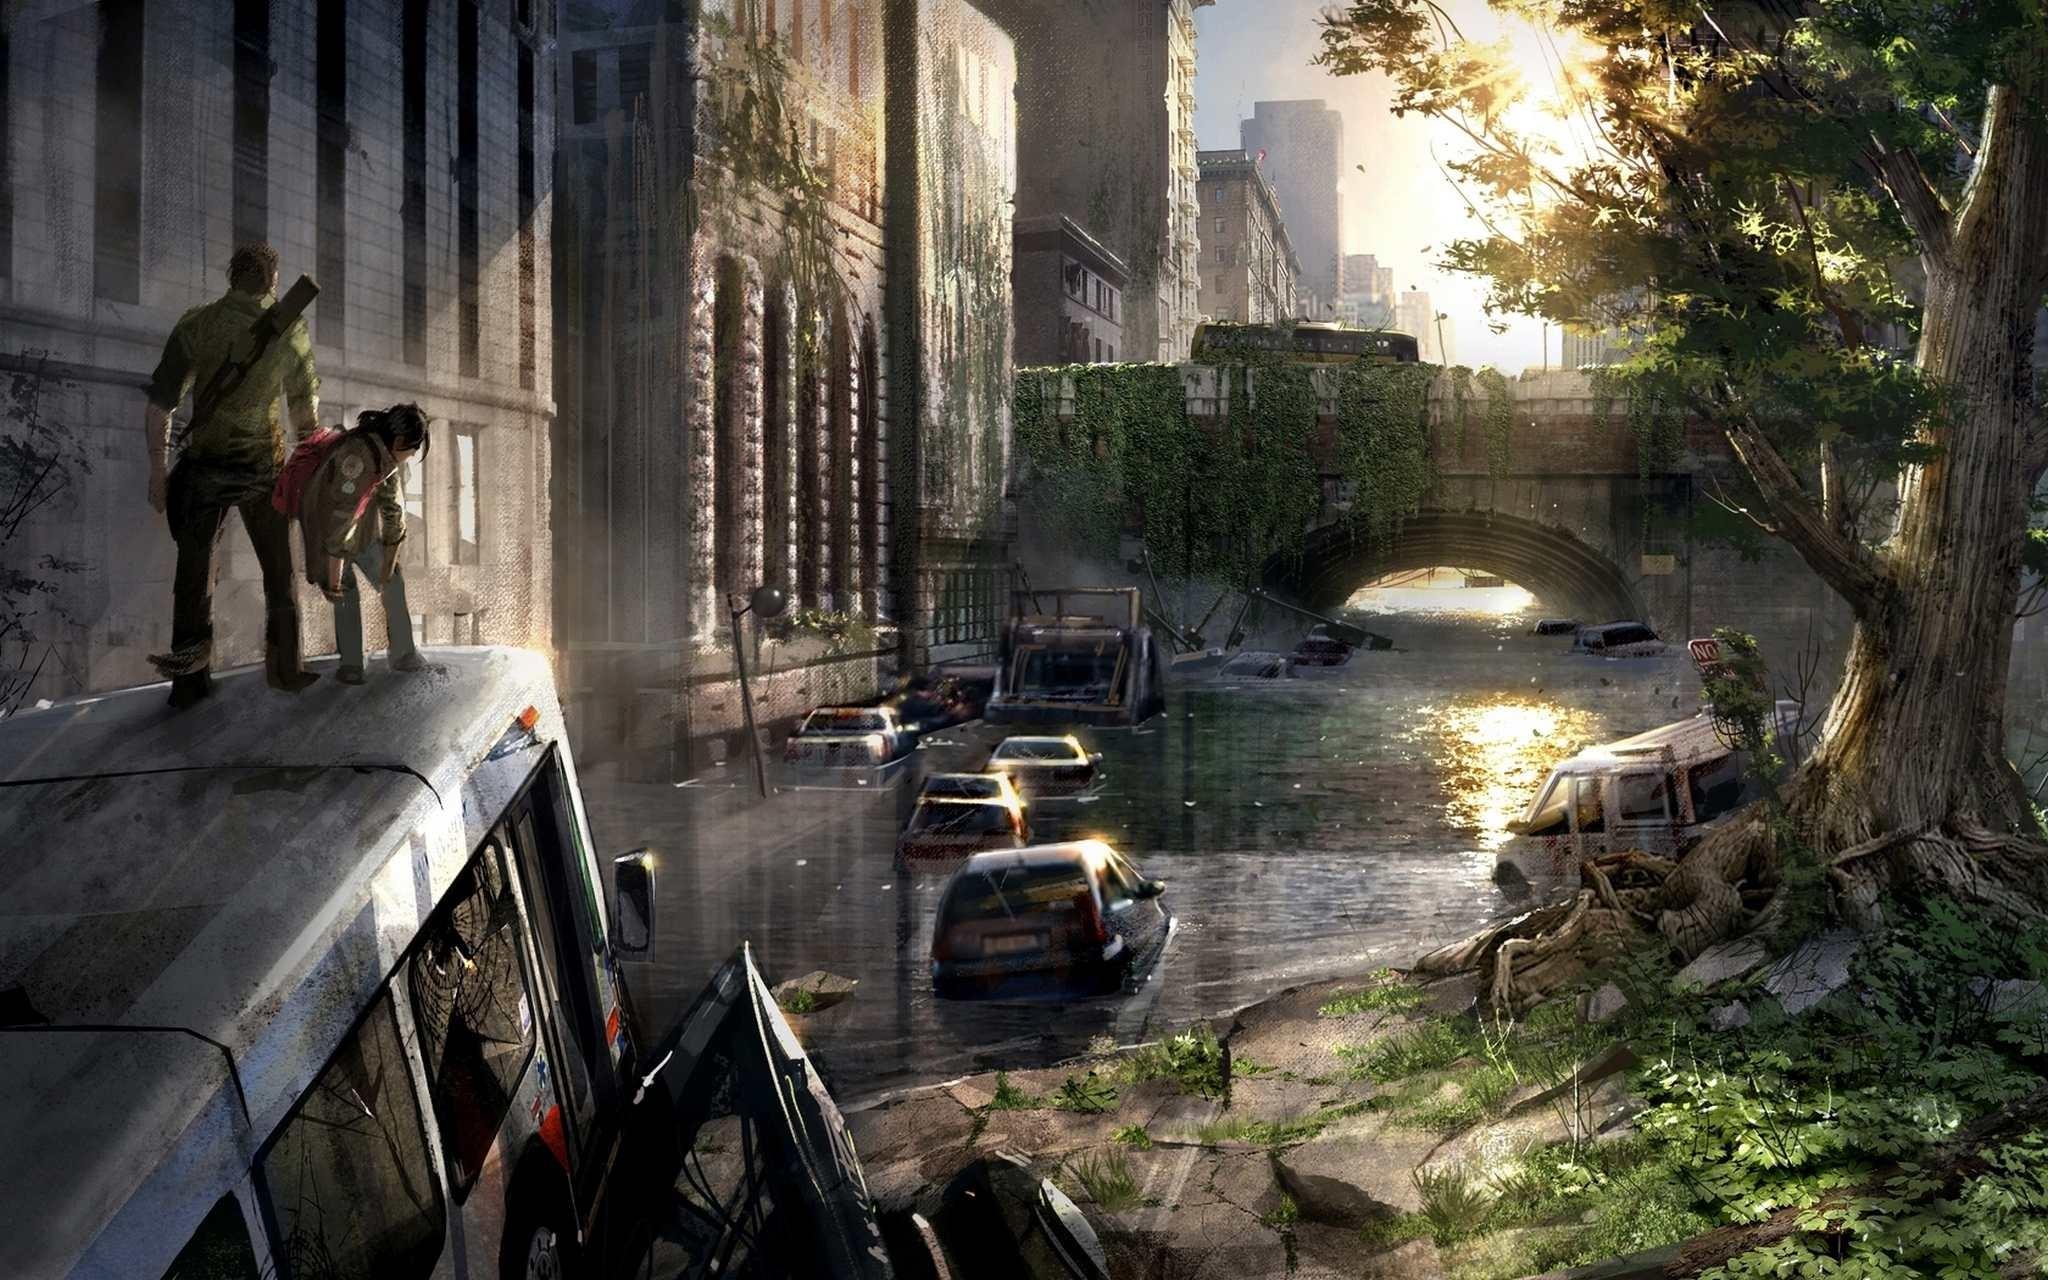 The Last Of Us Computer Wallpapers Desktop Backgrounds 2048x1280 2048x1280